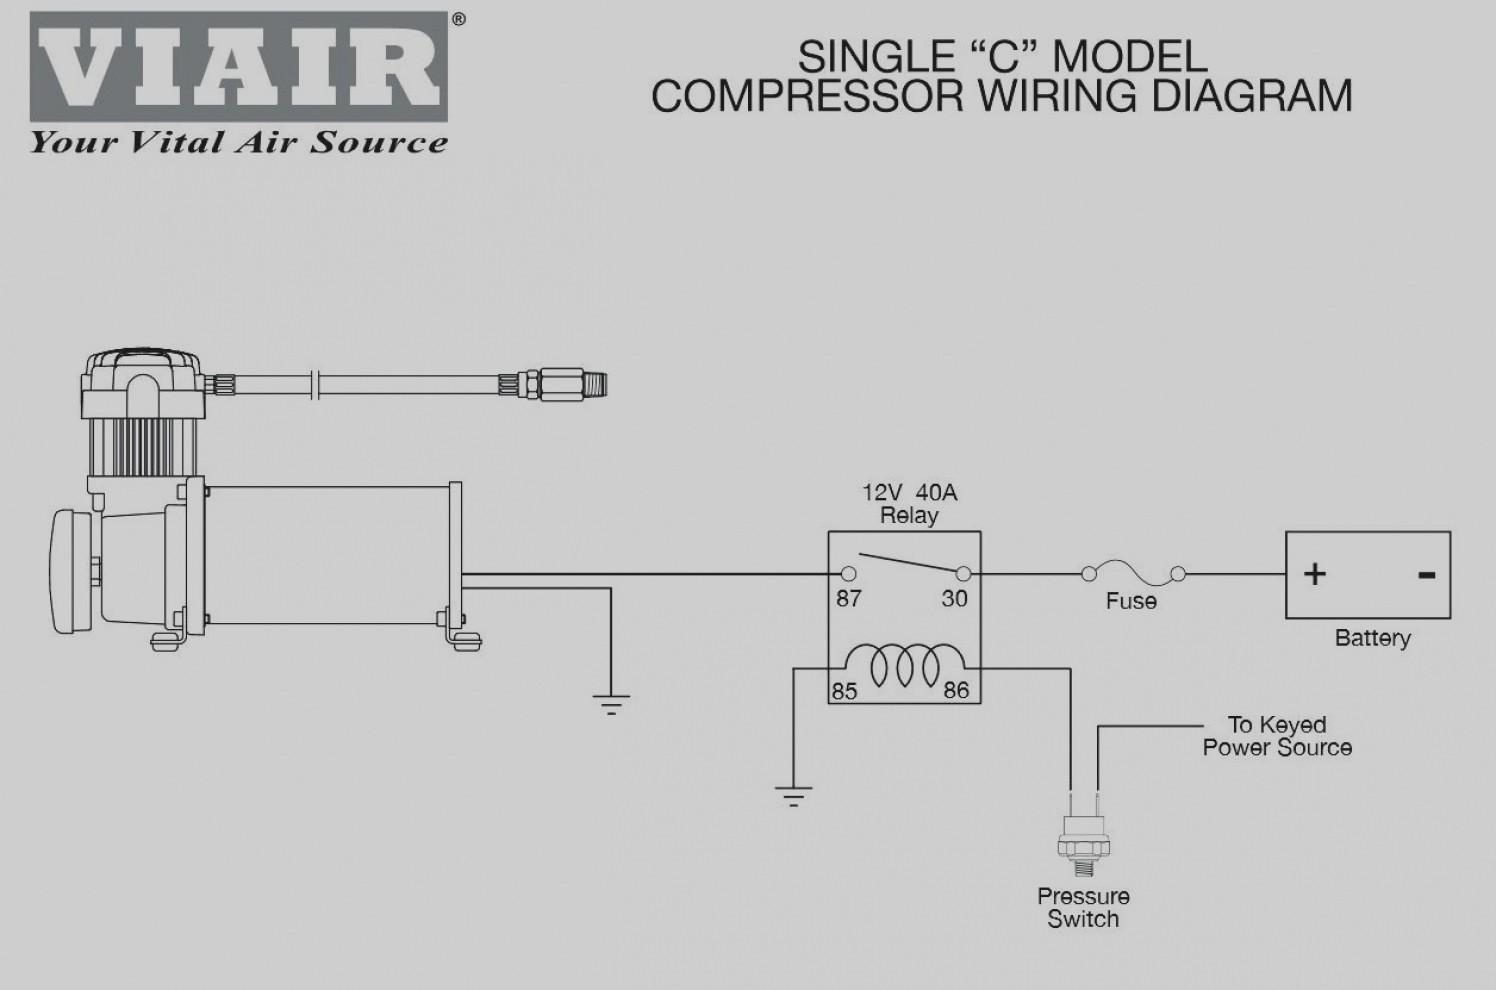 Train Horn Wire Diagram 3 Wire Pressure Transducer Diagram For Wiring Diagram Schematics